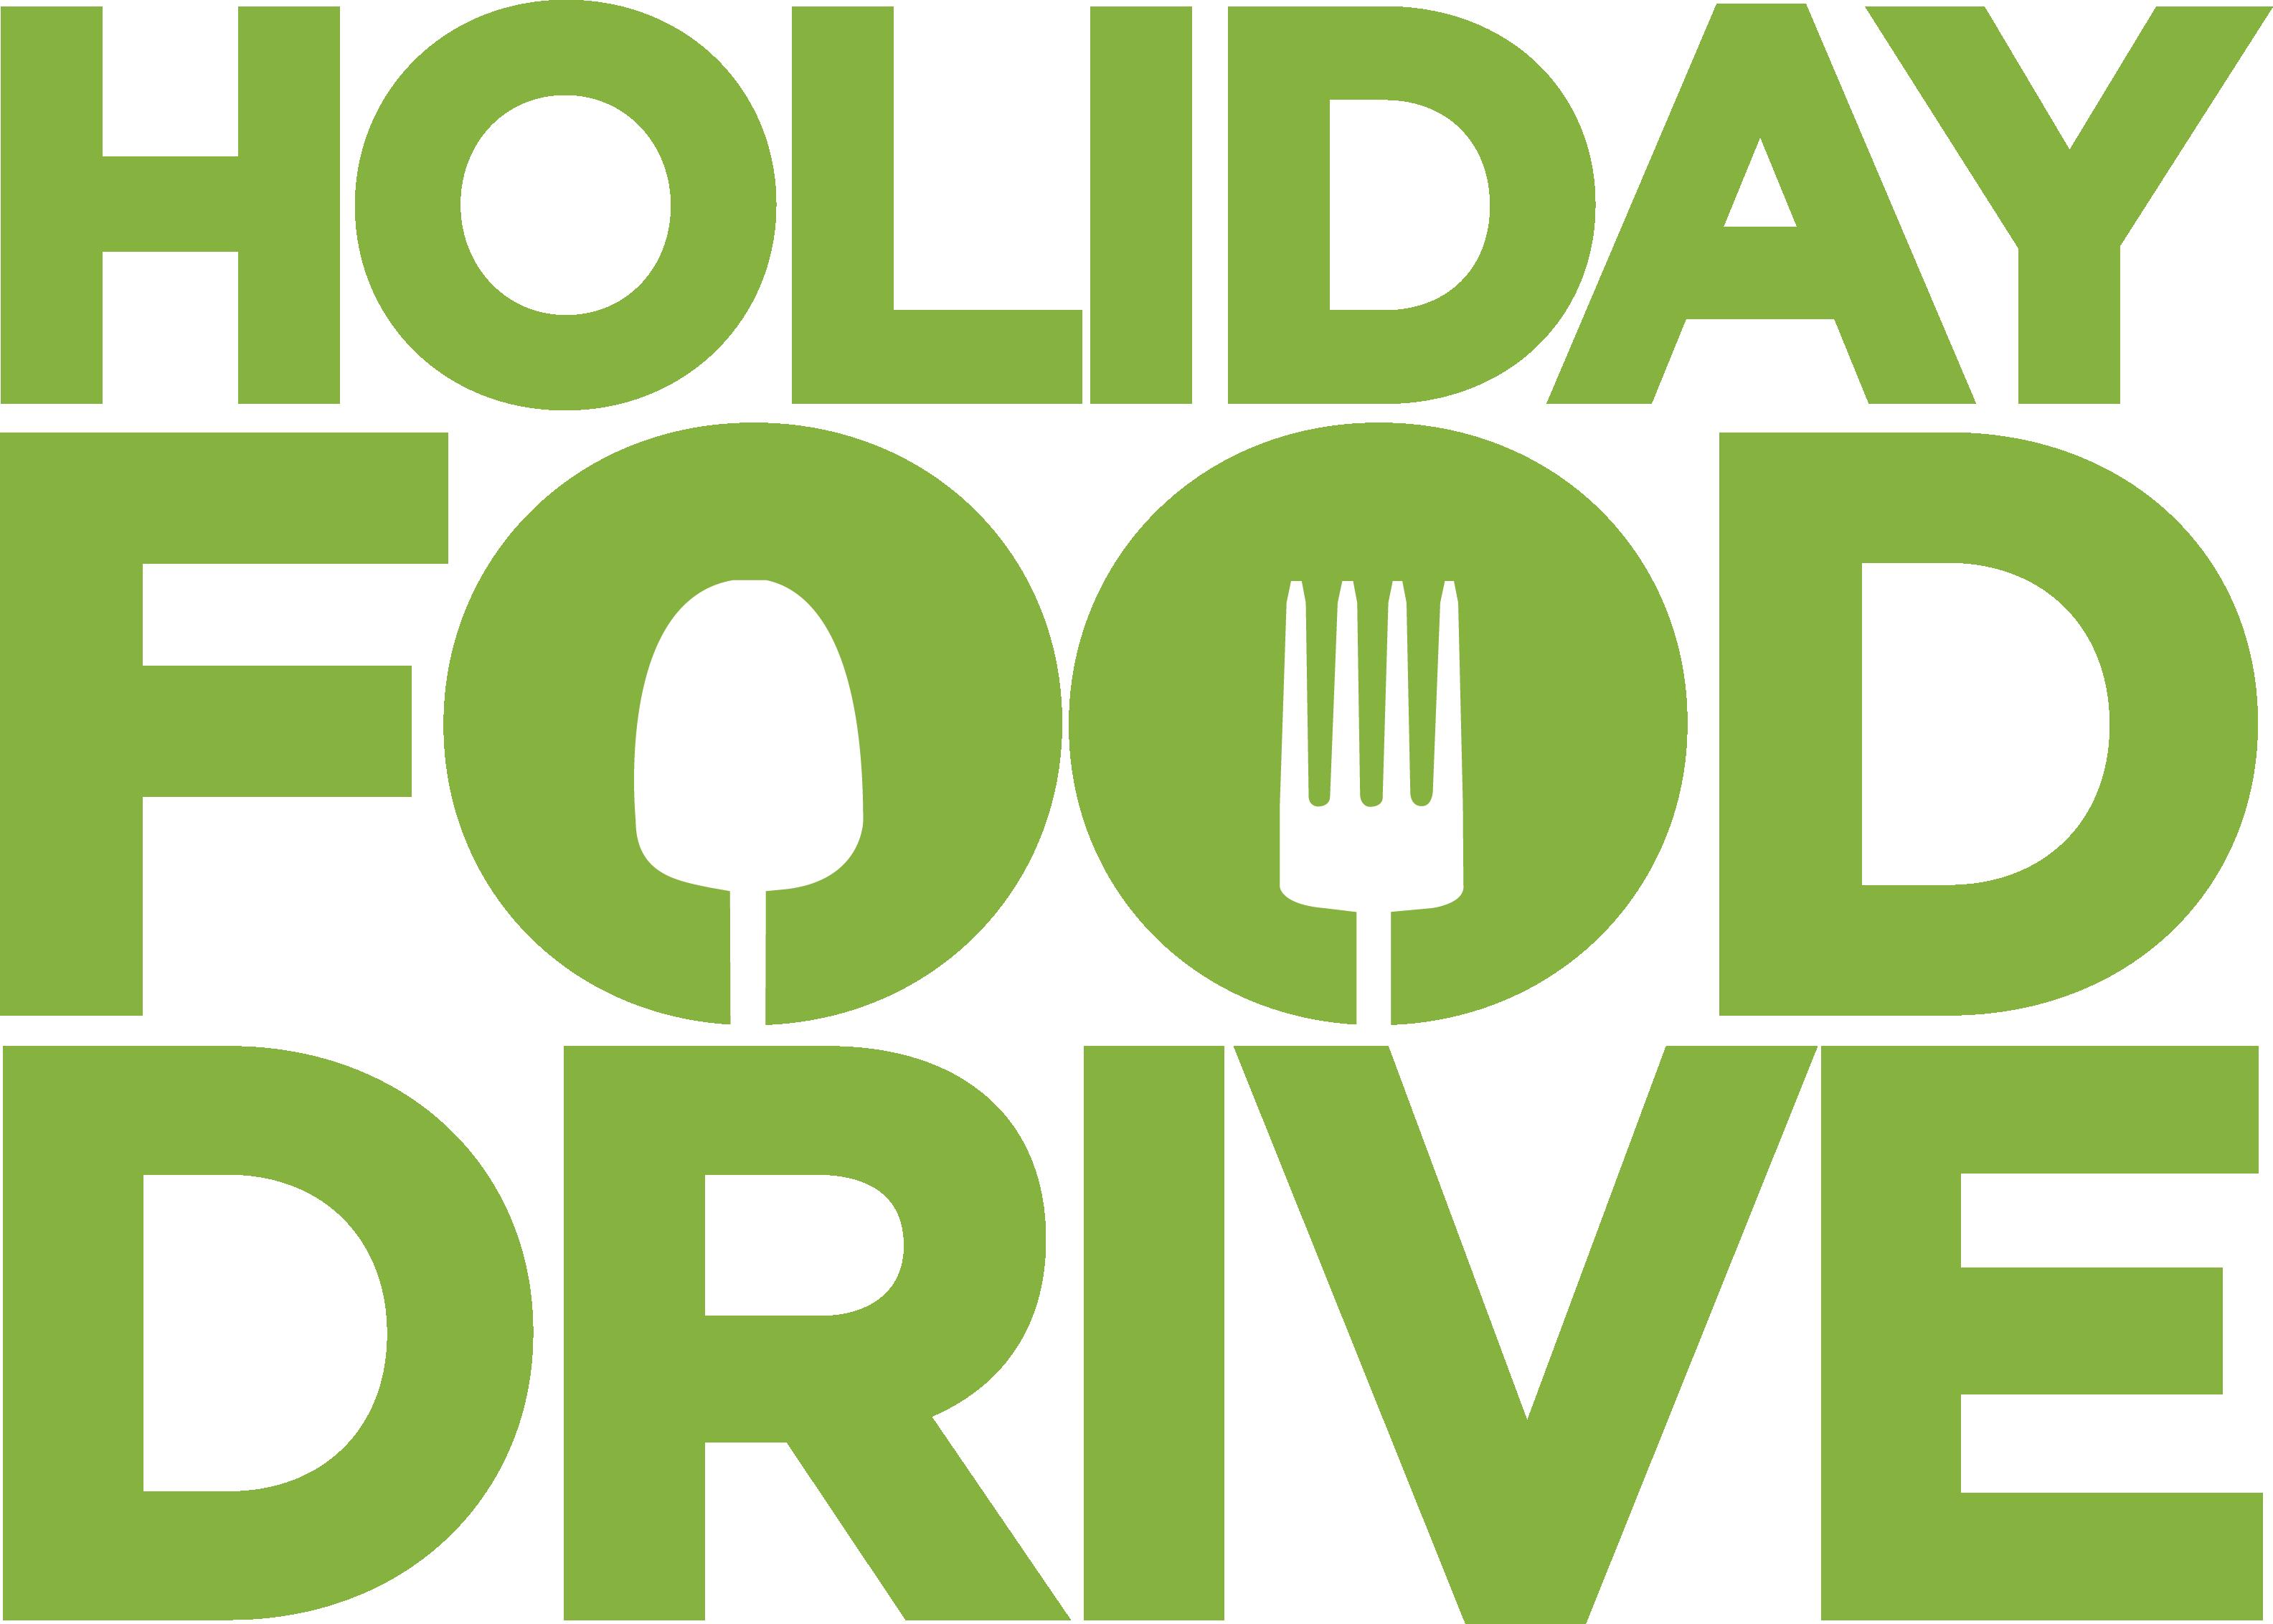 acua holiday food drive canned food clip art borders canned food clip art borders